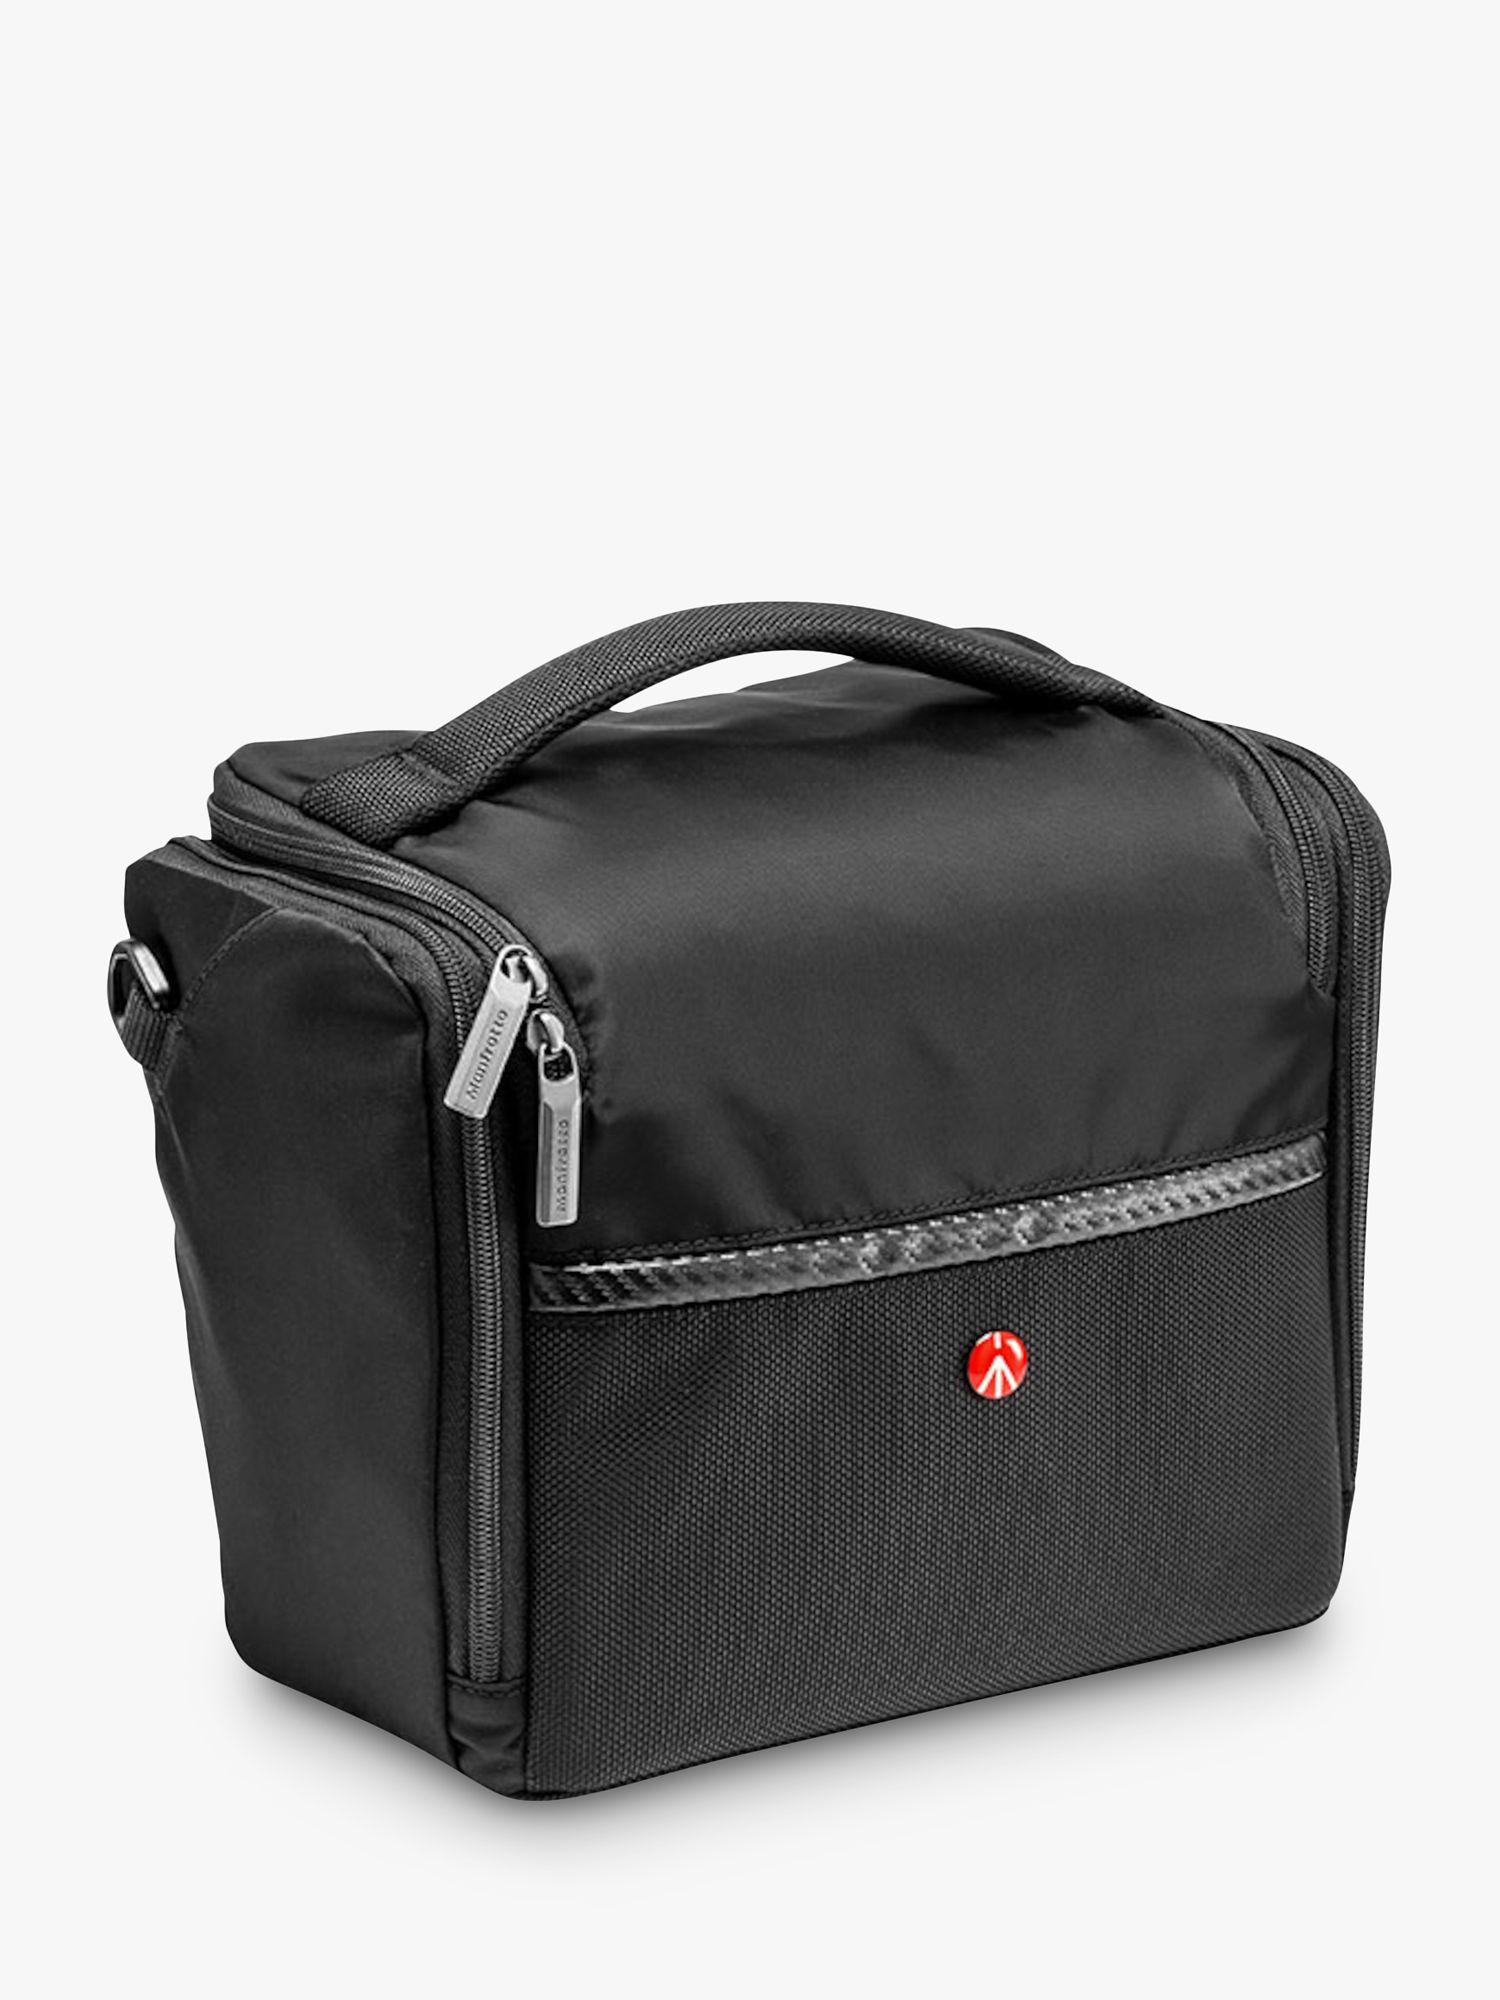 Manfrotto Manfrotto Advanced A6 Camera Shoulder Bag for DSLRs & CSCs, Black